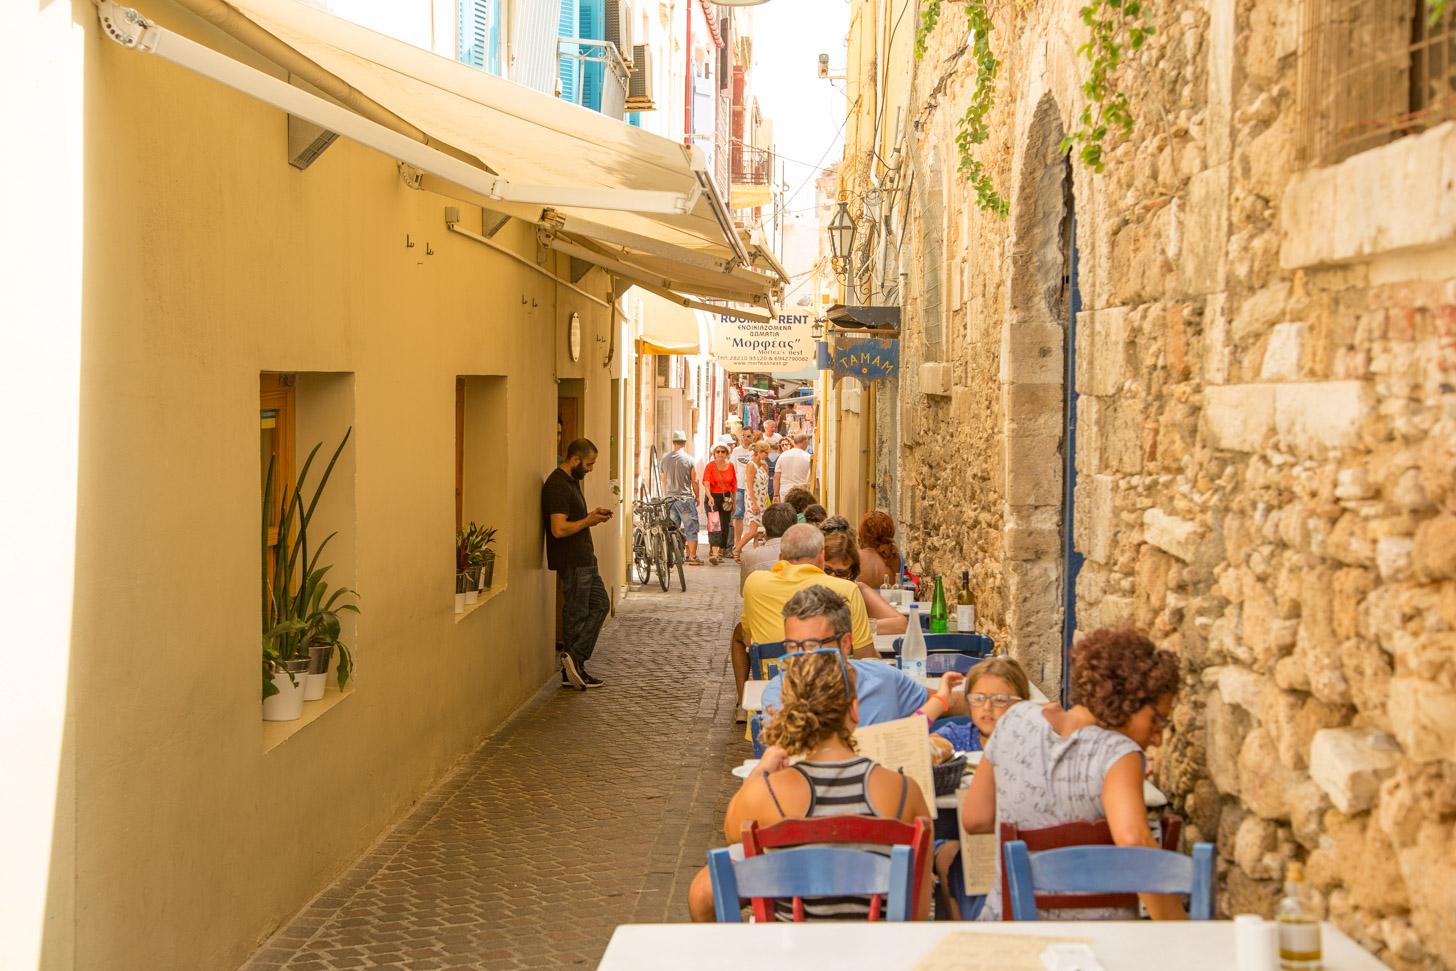 De oude binnenstad van Chania